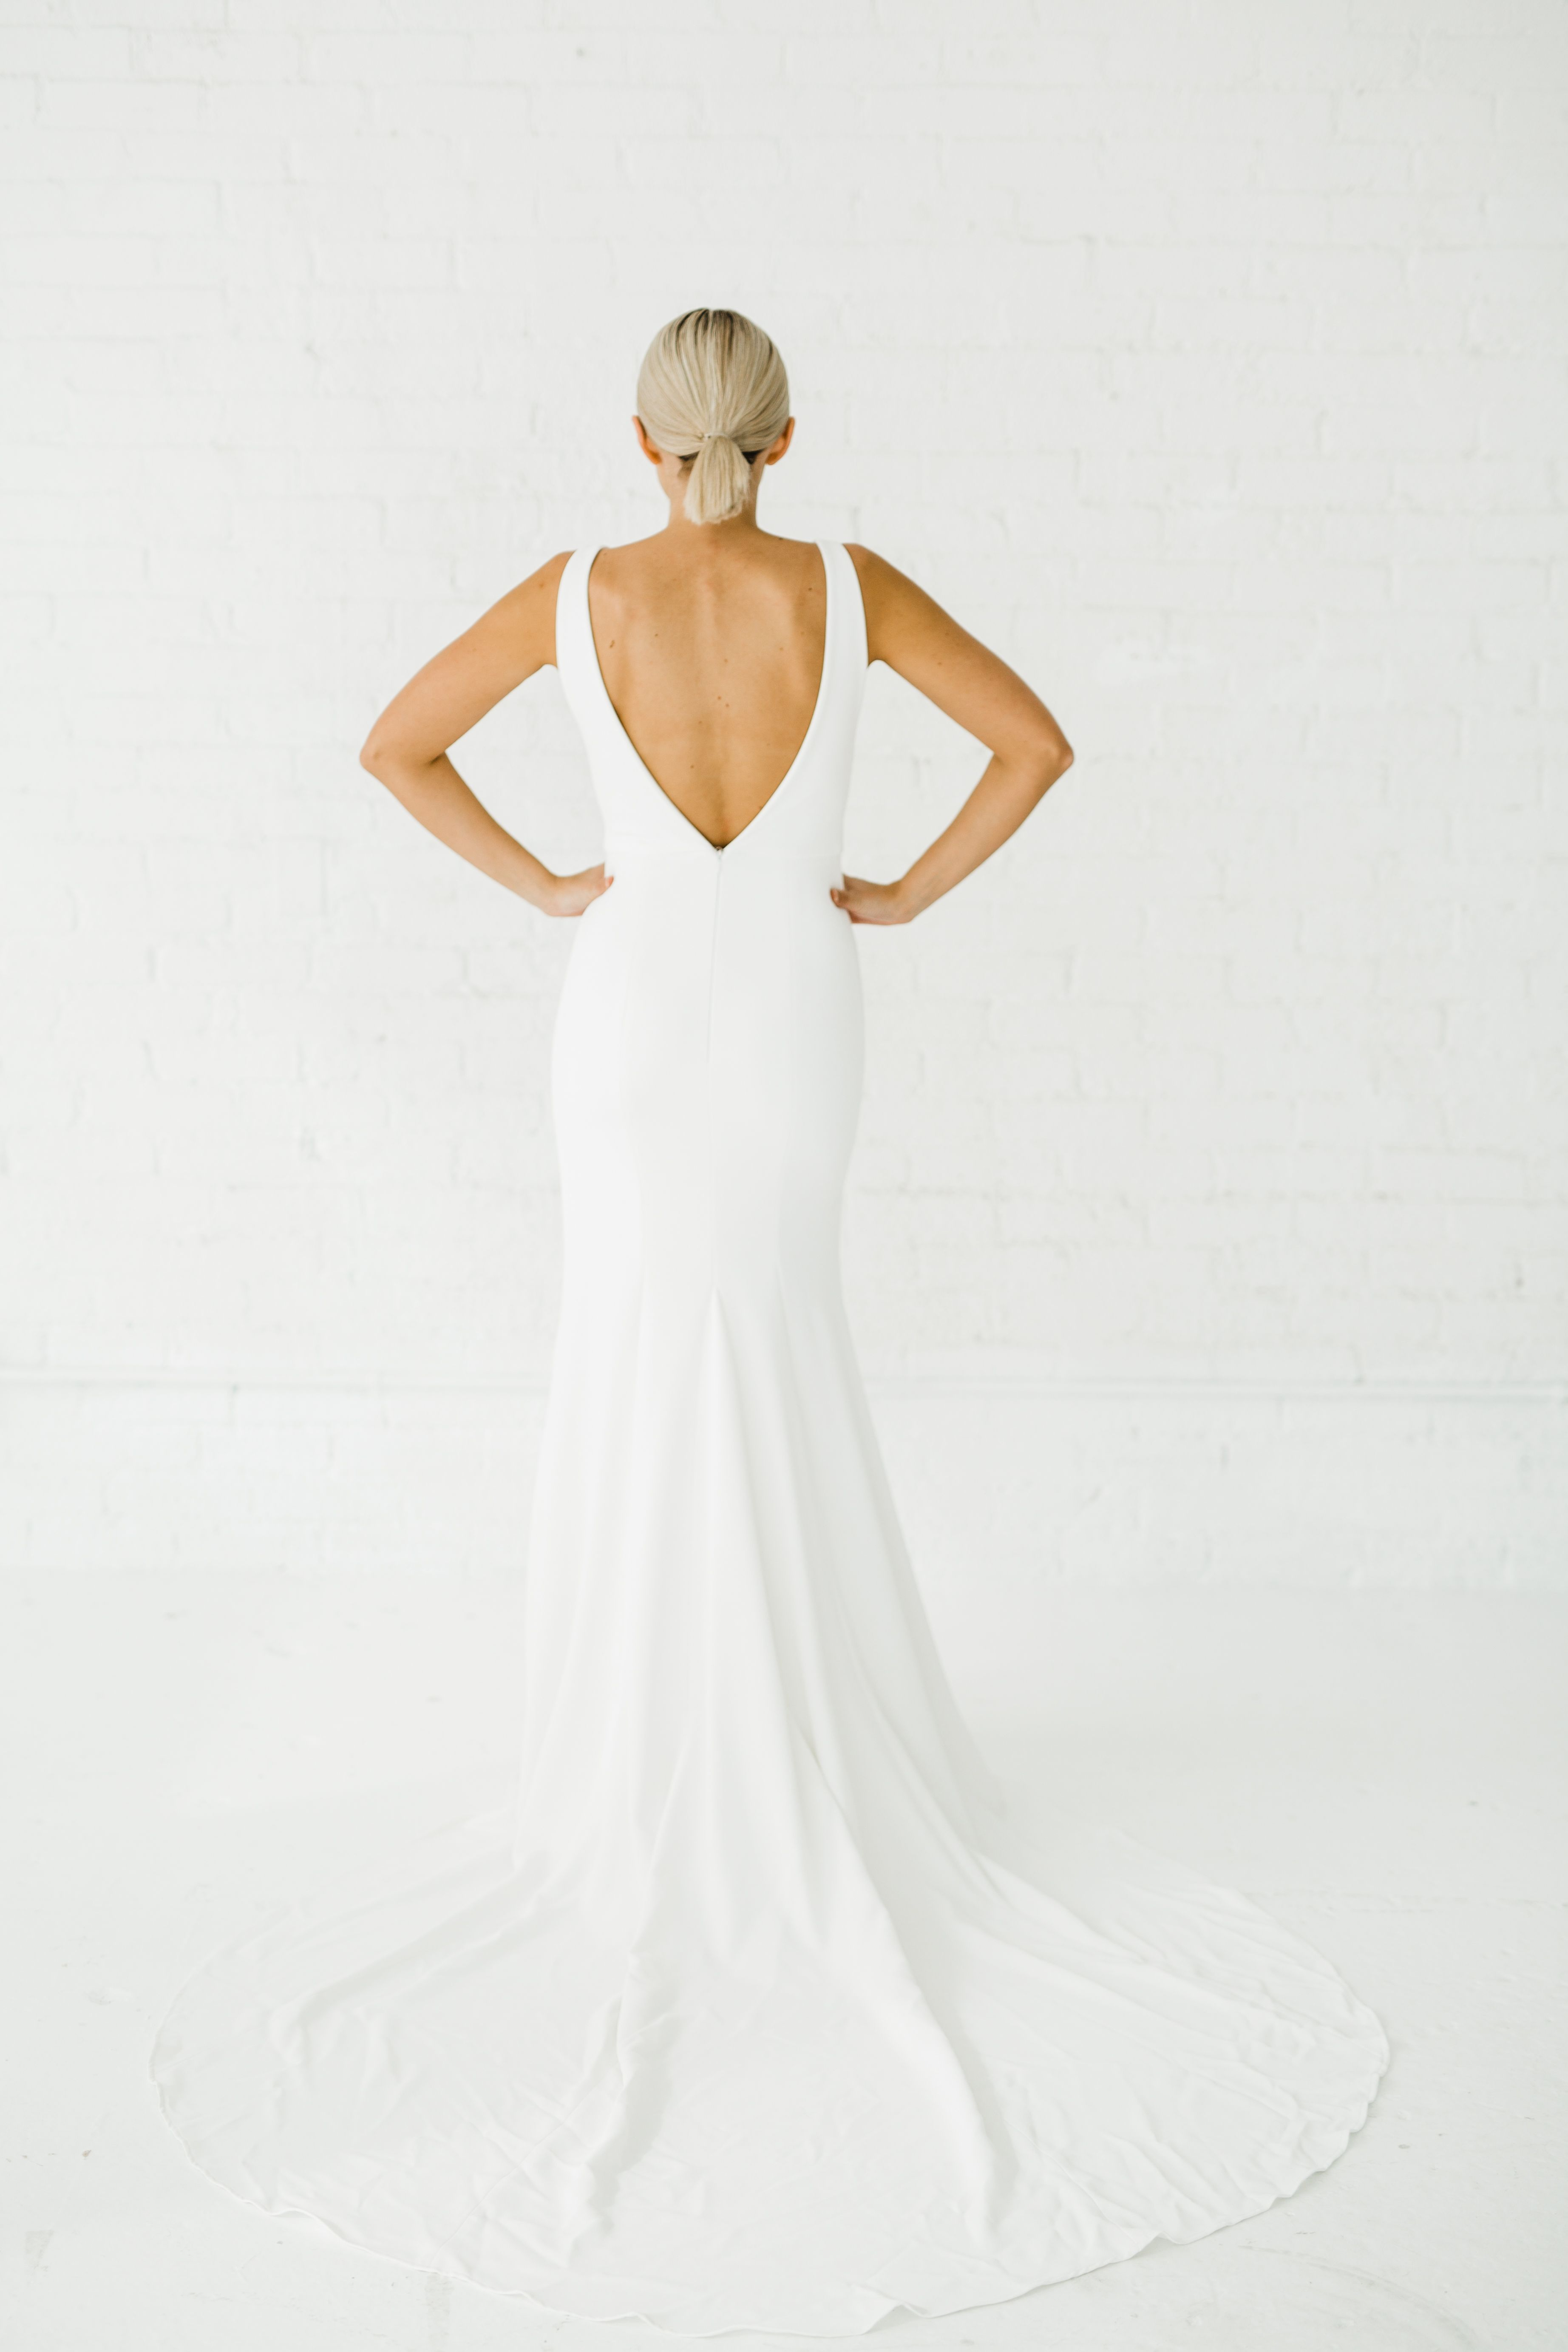 Maven Alyssa Kristin Chicago Wedding Dress Designer Agnes Rasek Photography Fitted Wedding Dress Wedding Dresses Simple Wedding Dresses Chicago